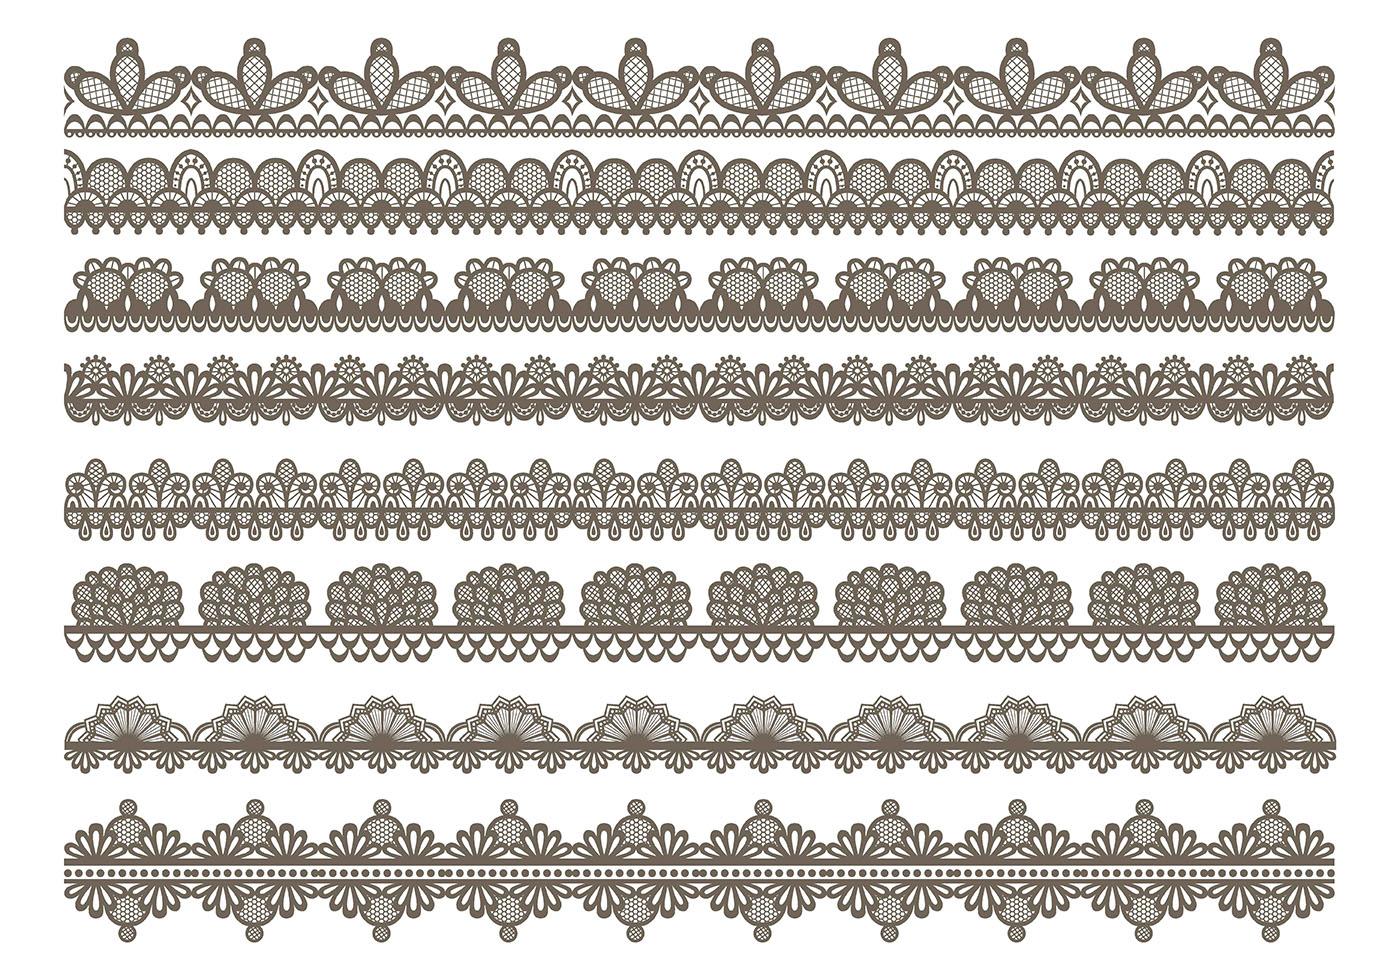 1400x980 Lace Trim Free Vector Art